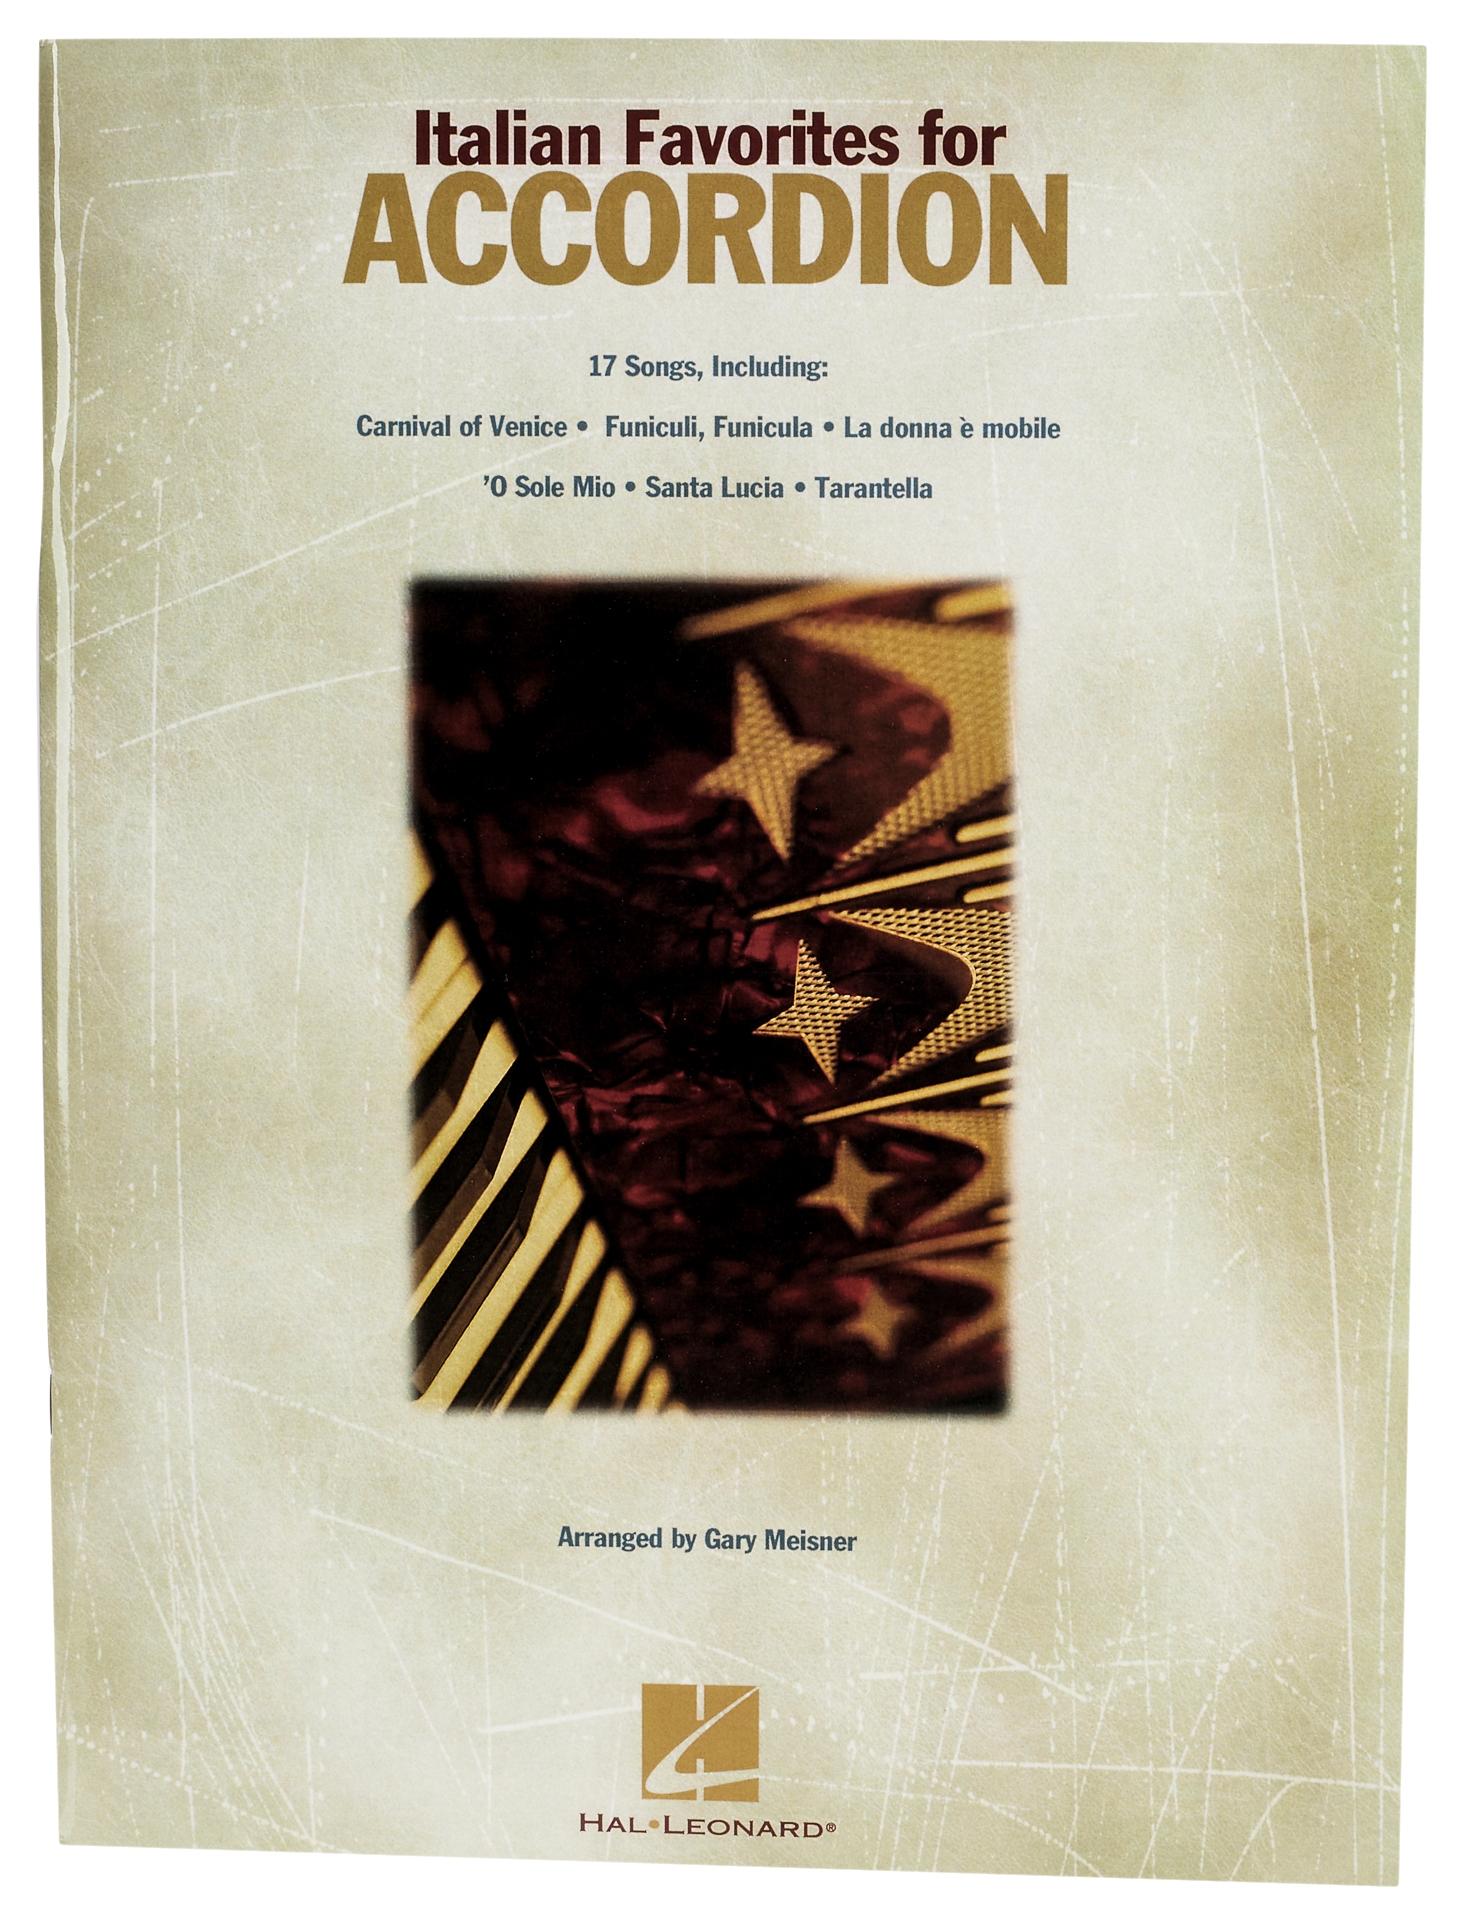 MS Italian Songs For Accordion